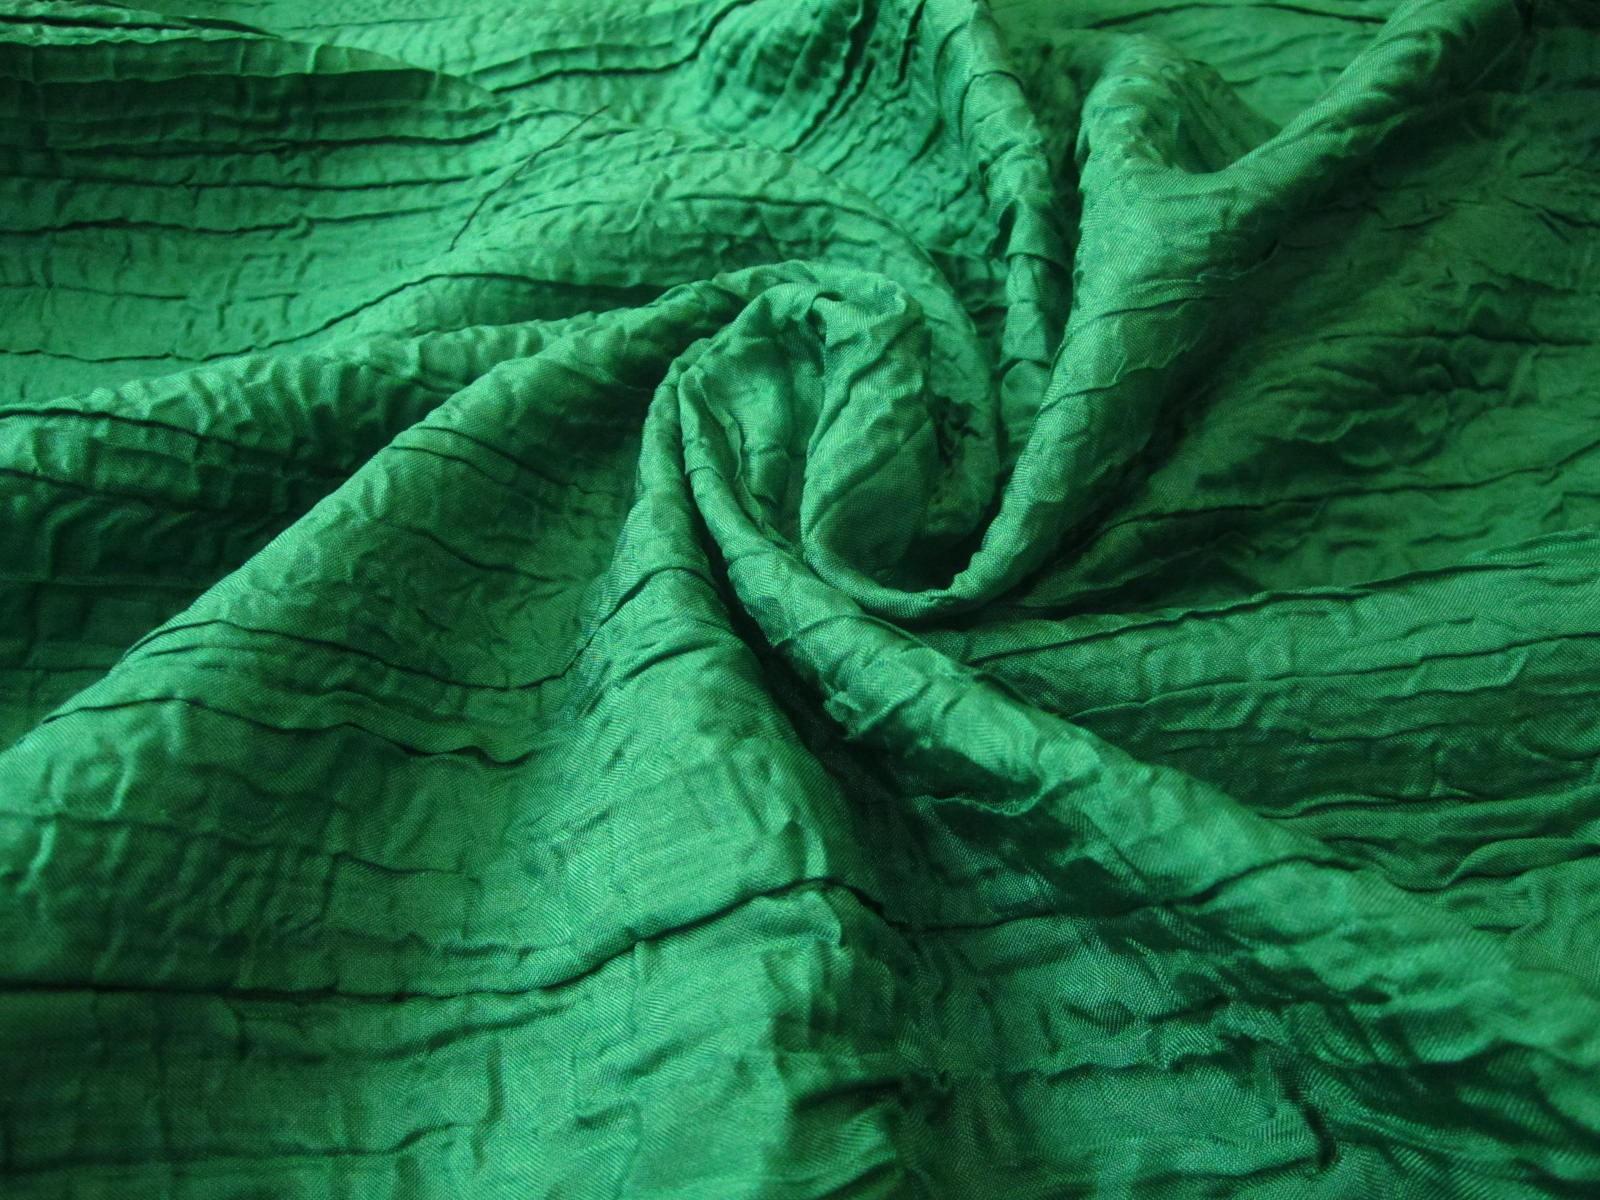 Ekskluzywny francuski jedwab drapee fuksja Ekskluzywny francuski jedwab drapee fuksja zieleń szmaragdowa